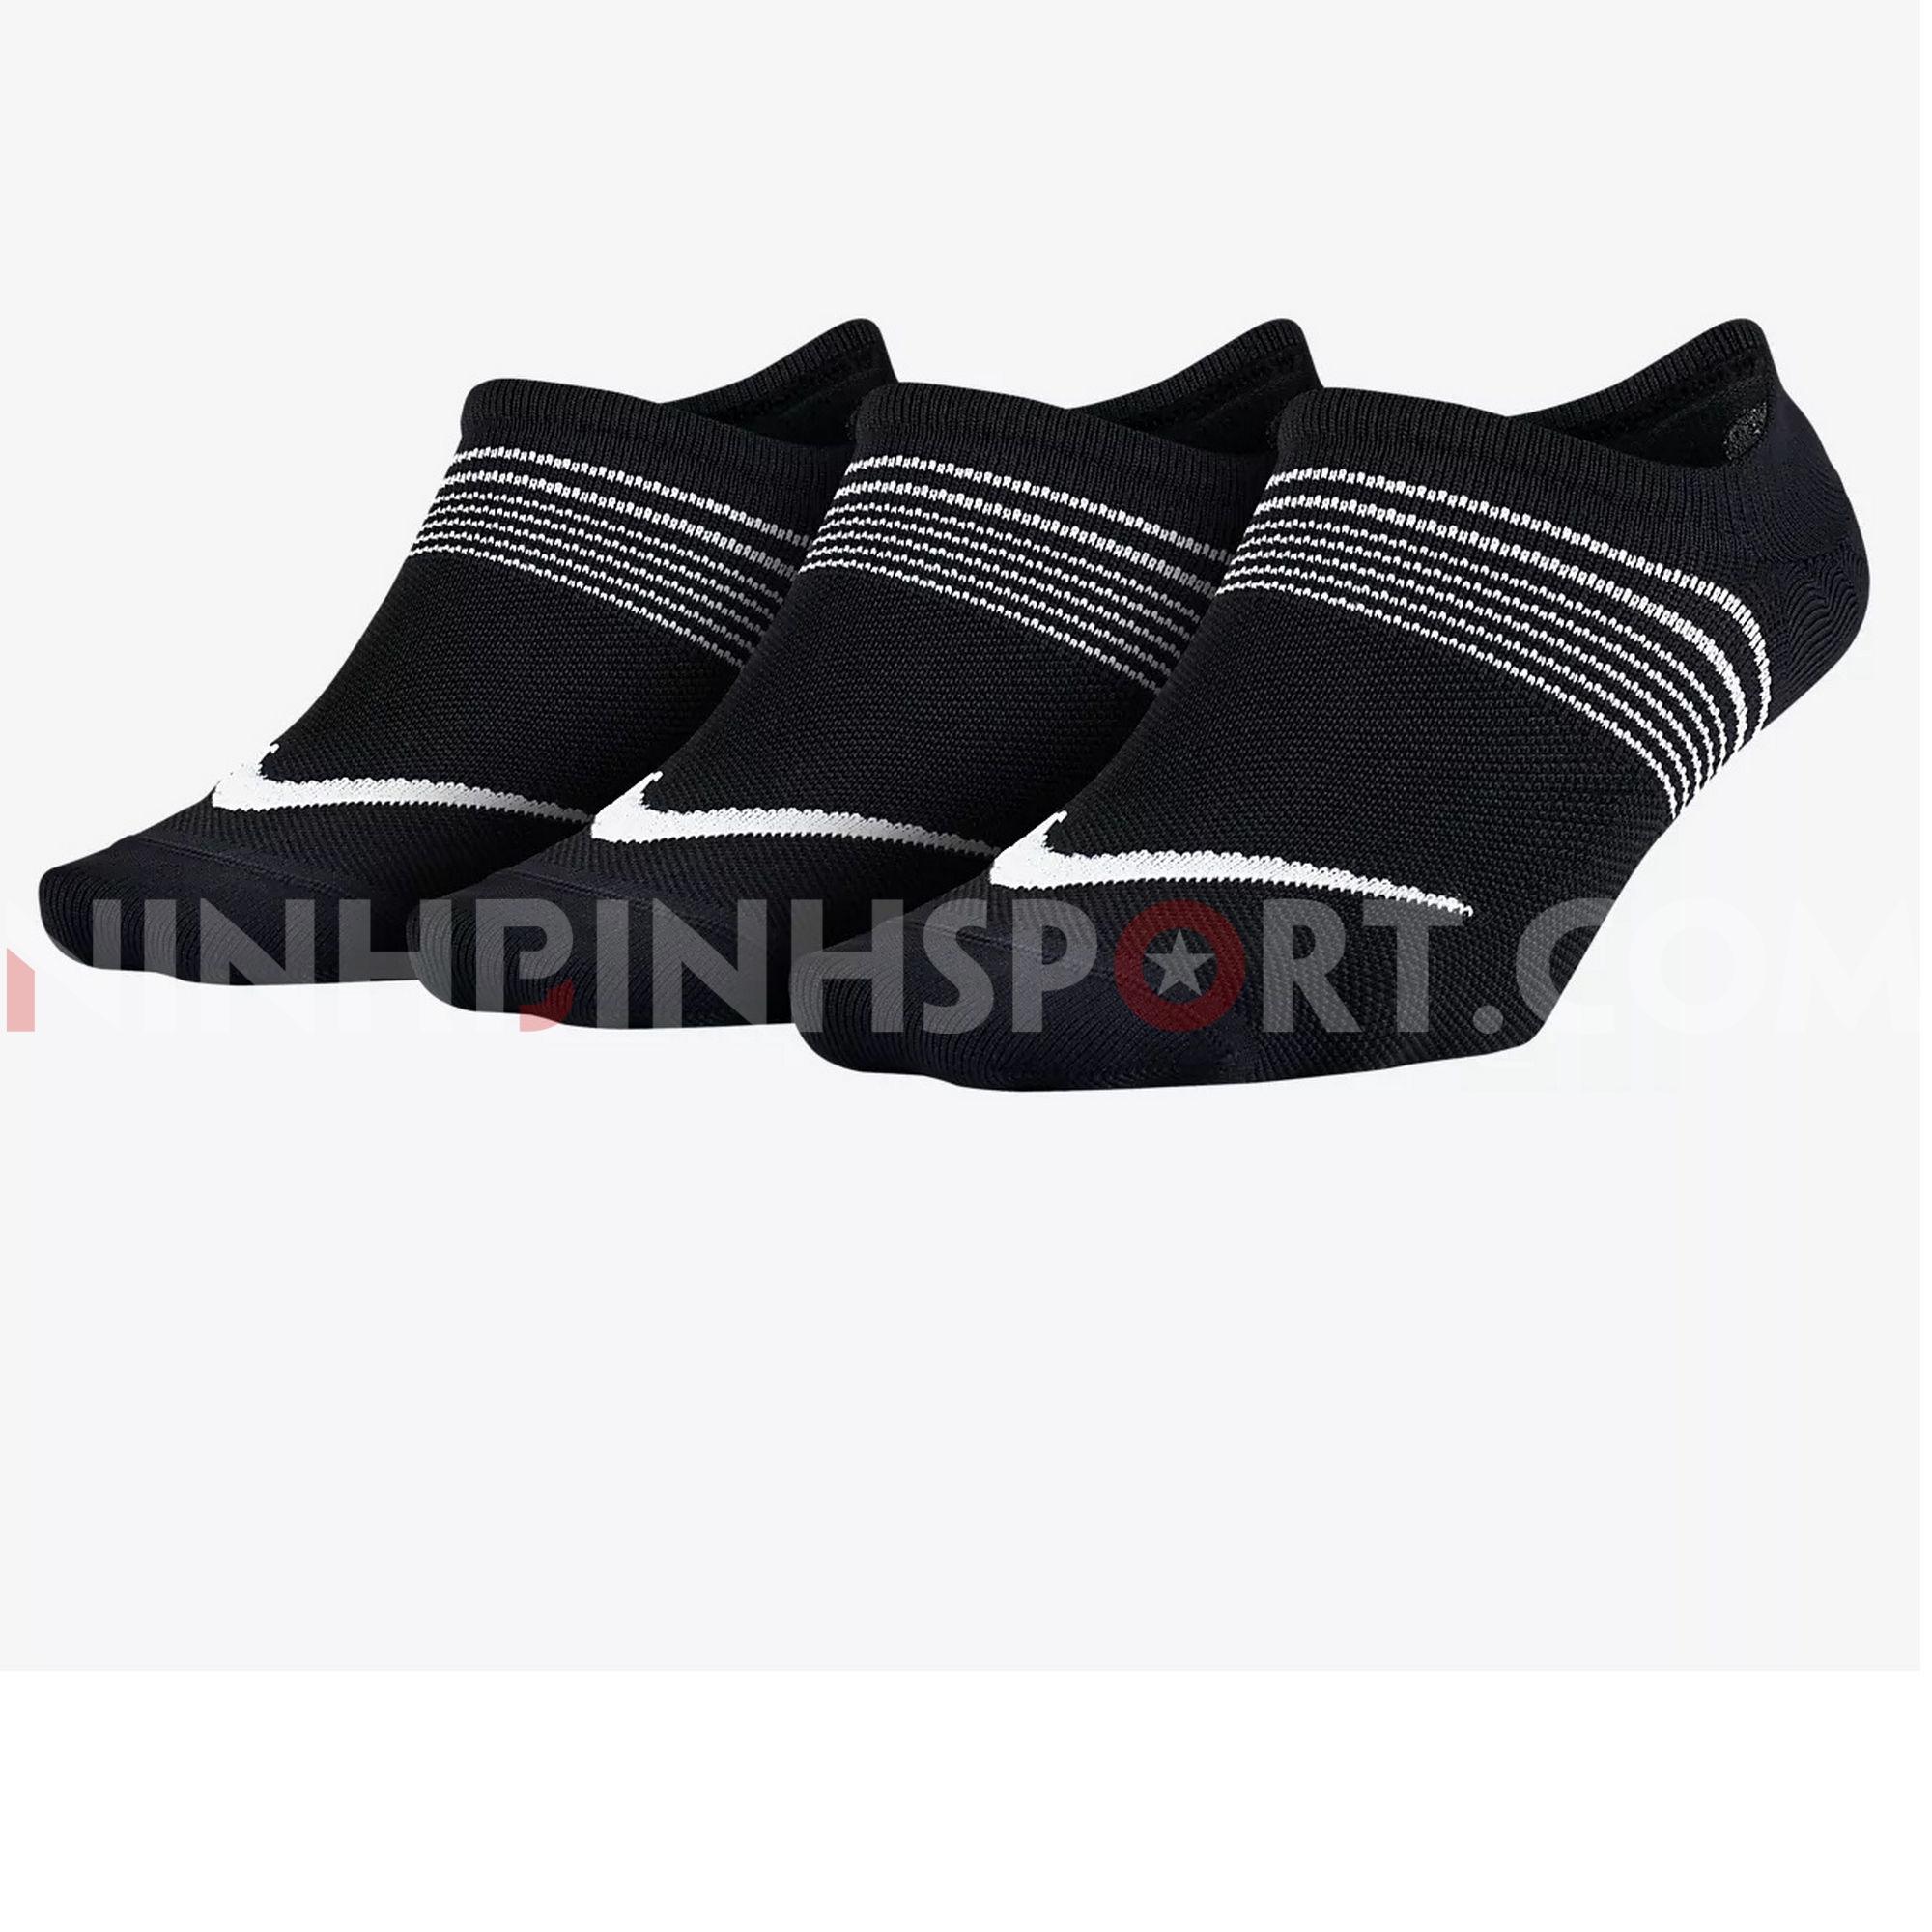 Tất thể thao nữ Nike Lightweight Training SX5277-010